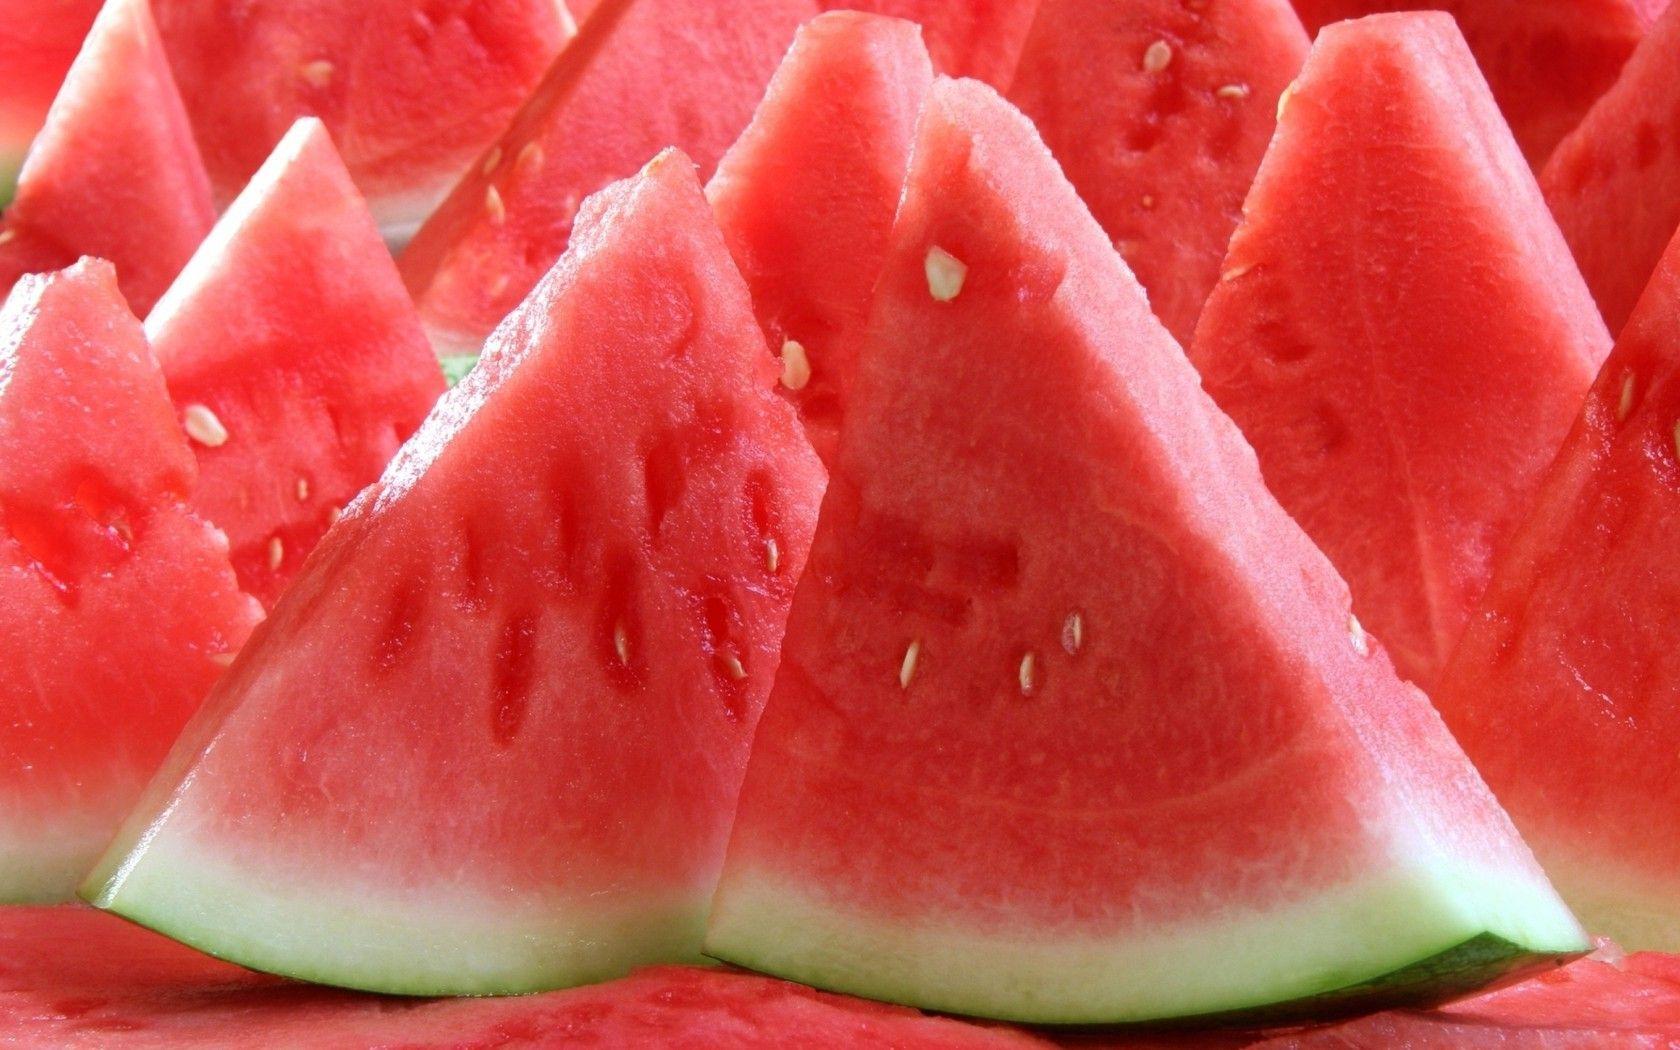 watermelon photographs